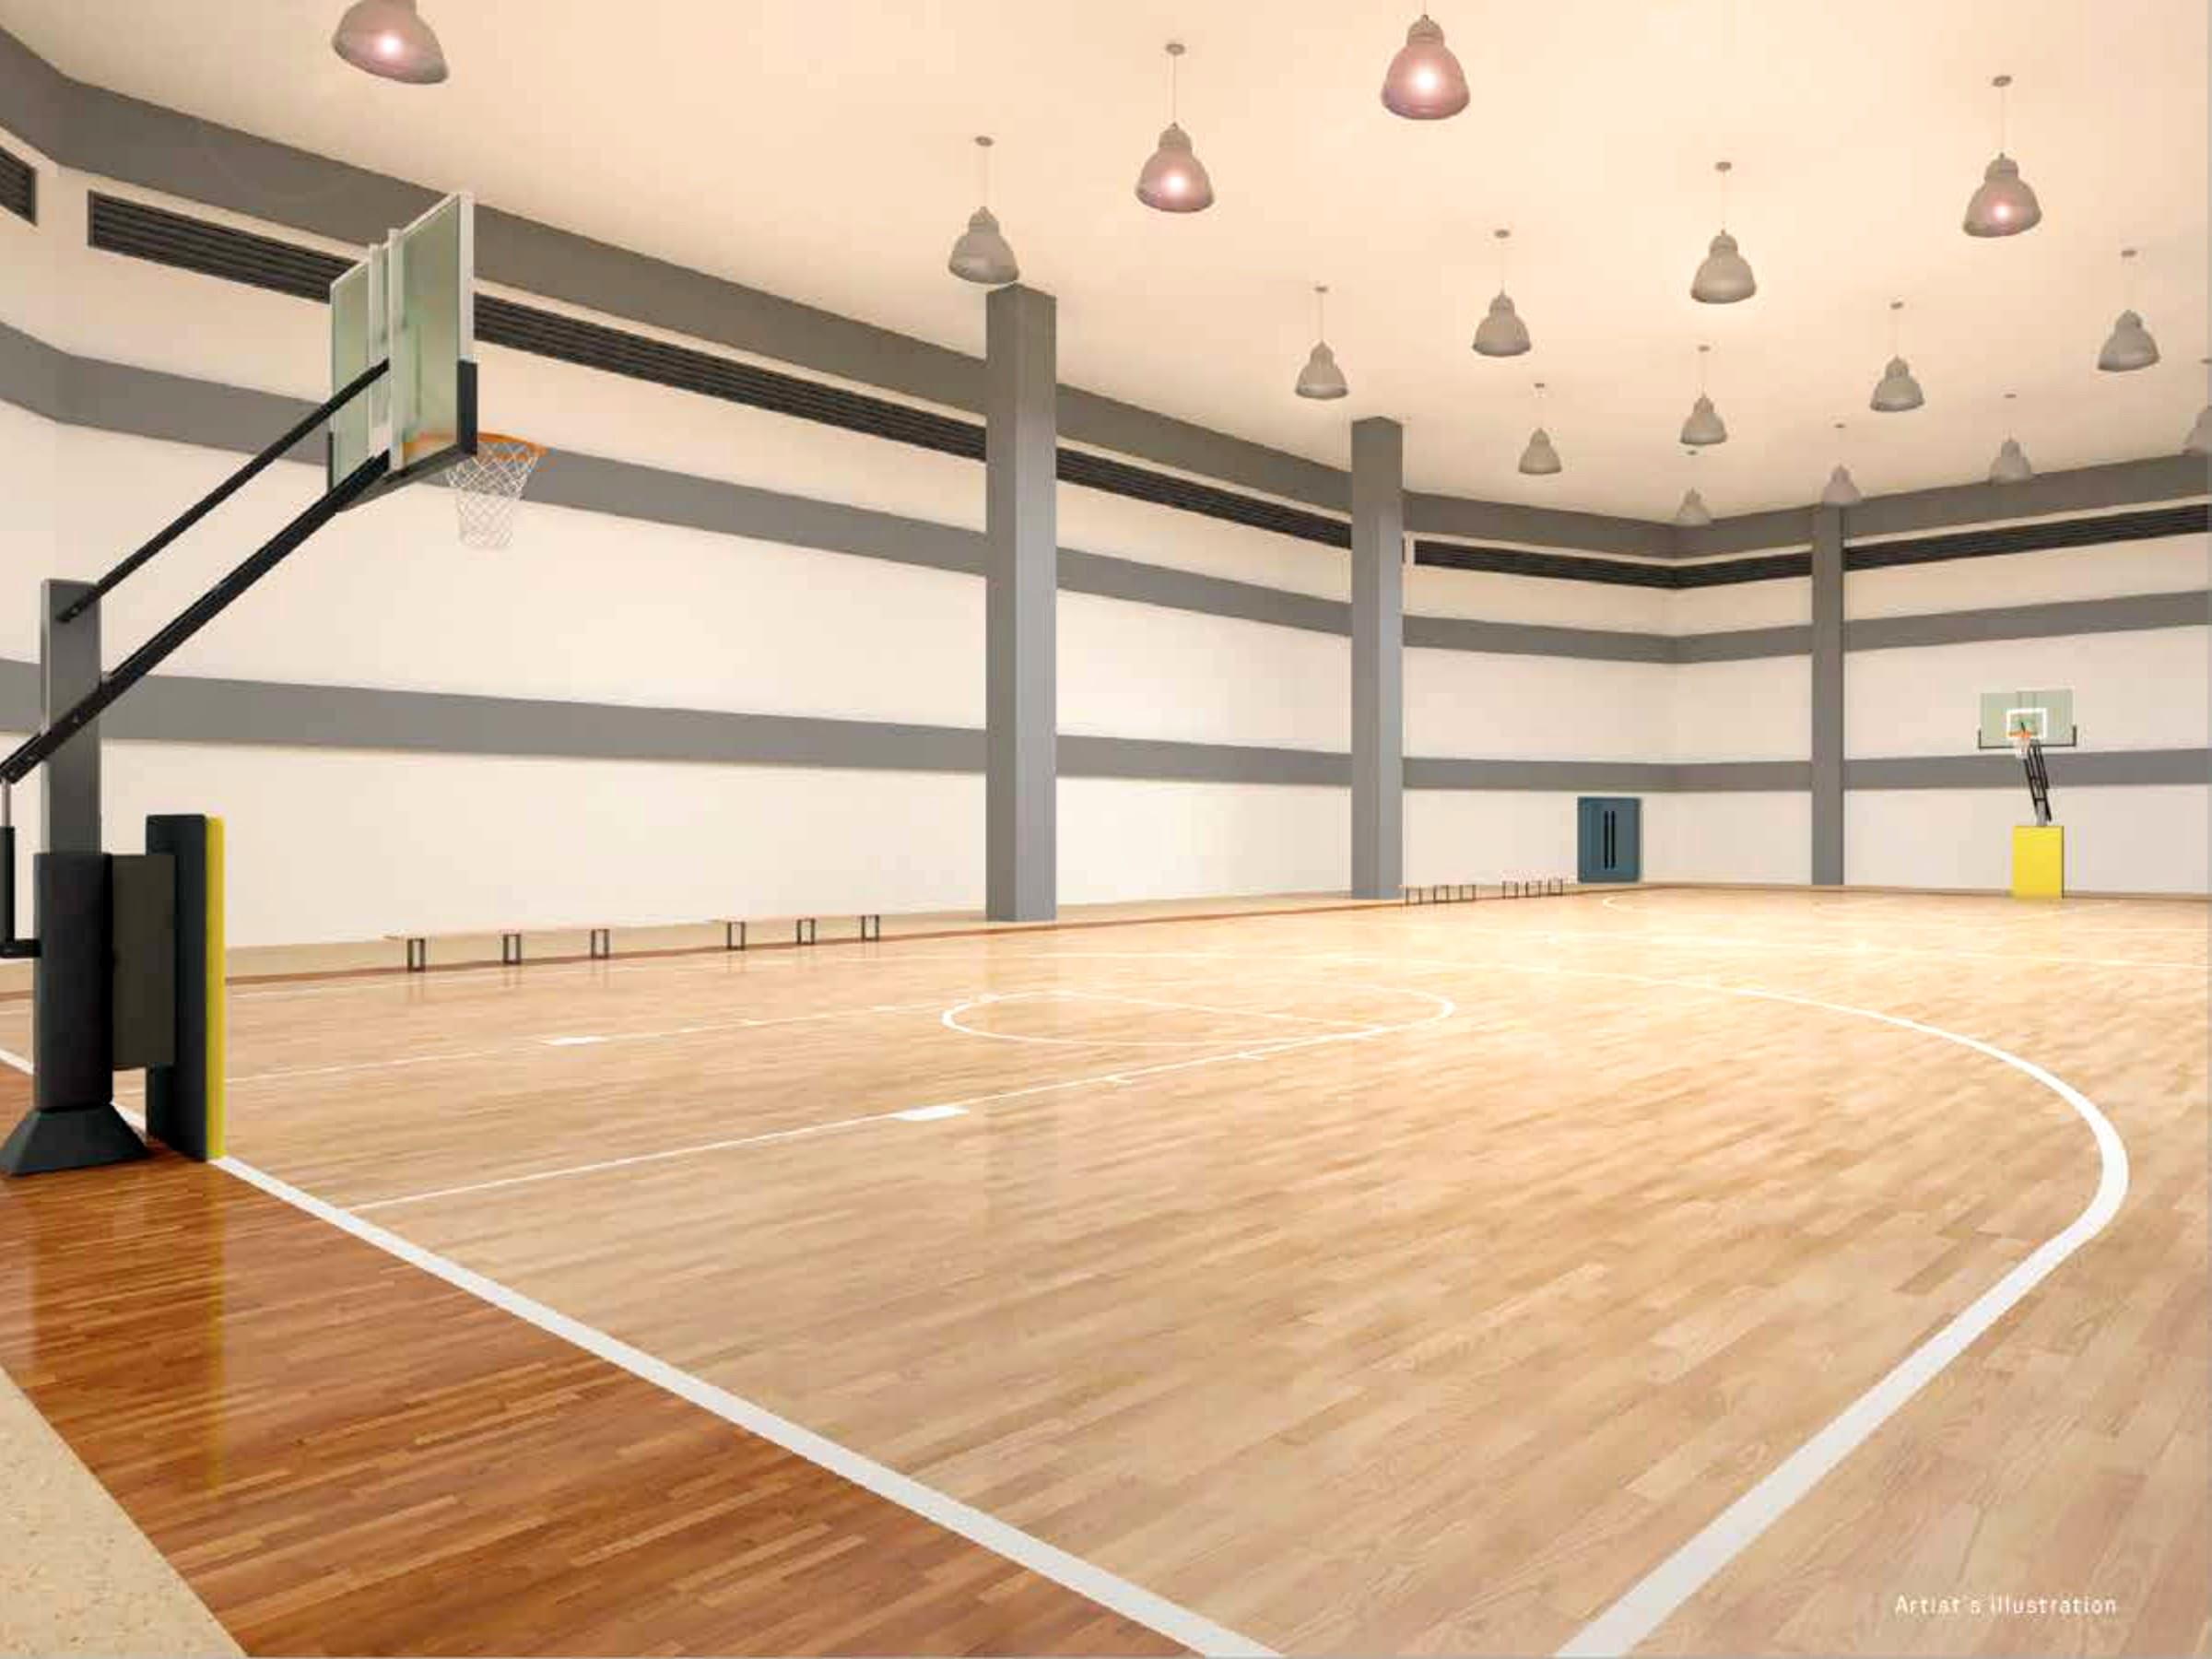 The Arton by Rockwell, Katipunan, Quezon City basketball court